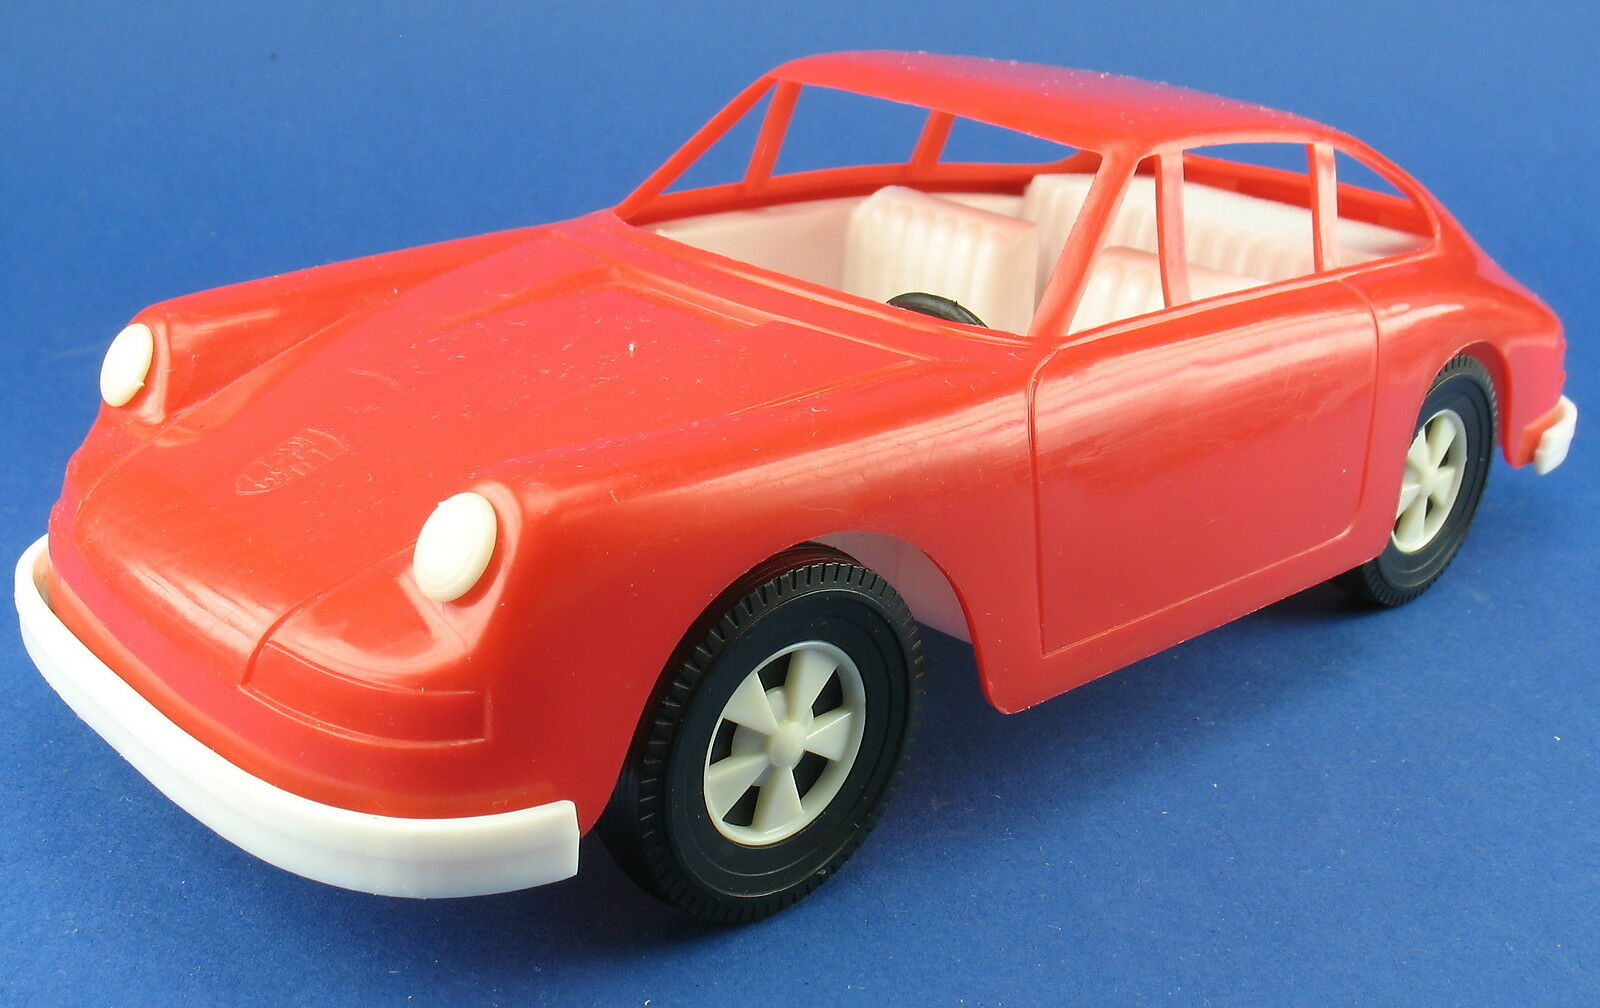 Porsche 911 - Kunstoff-Modell - rot - ca. 20,5 cm - Made in W. GERMANY - Plastik